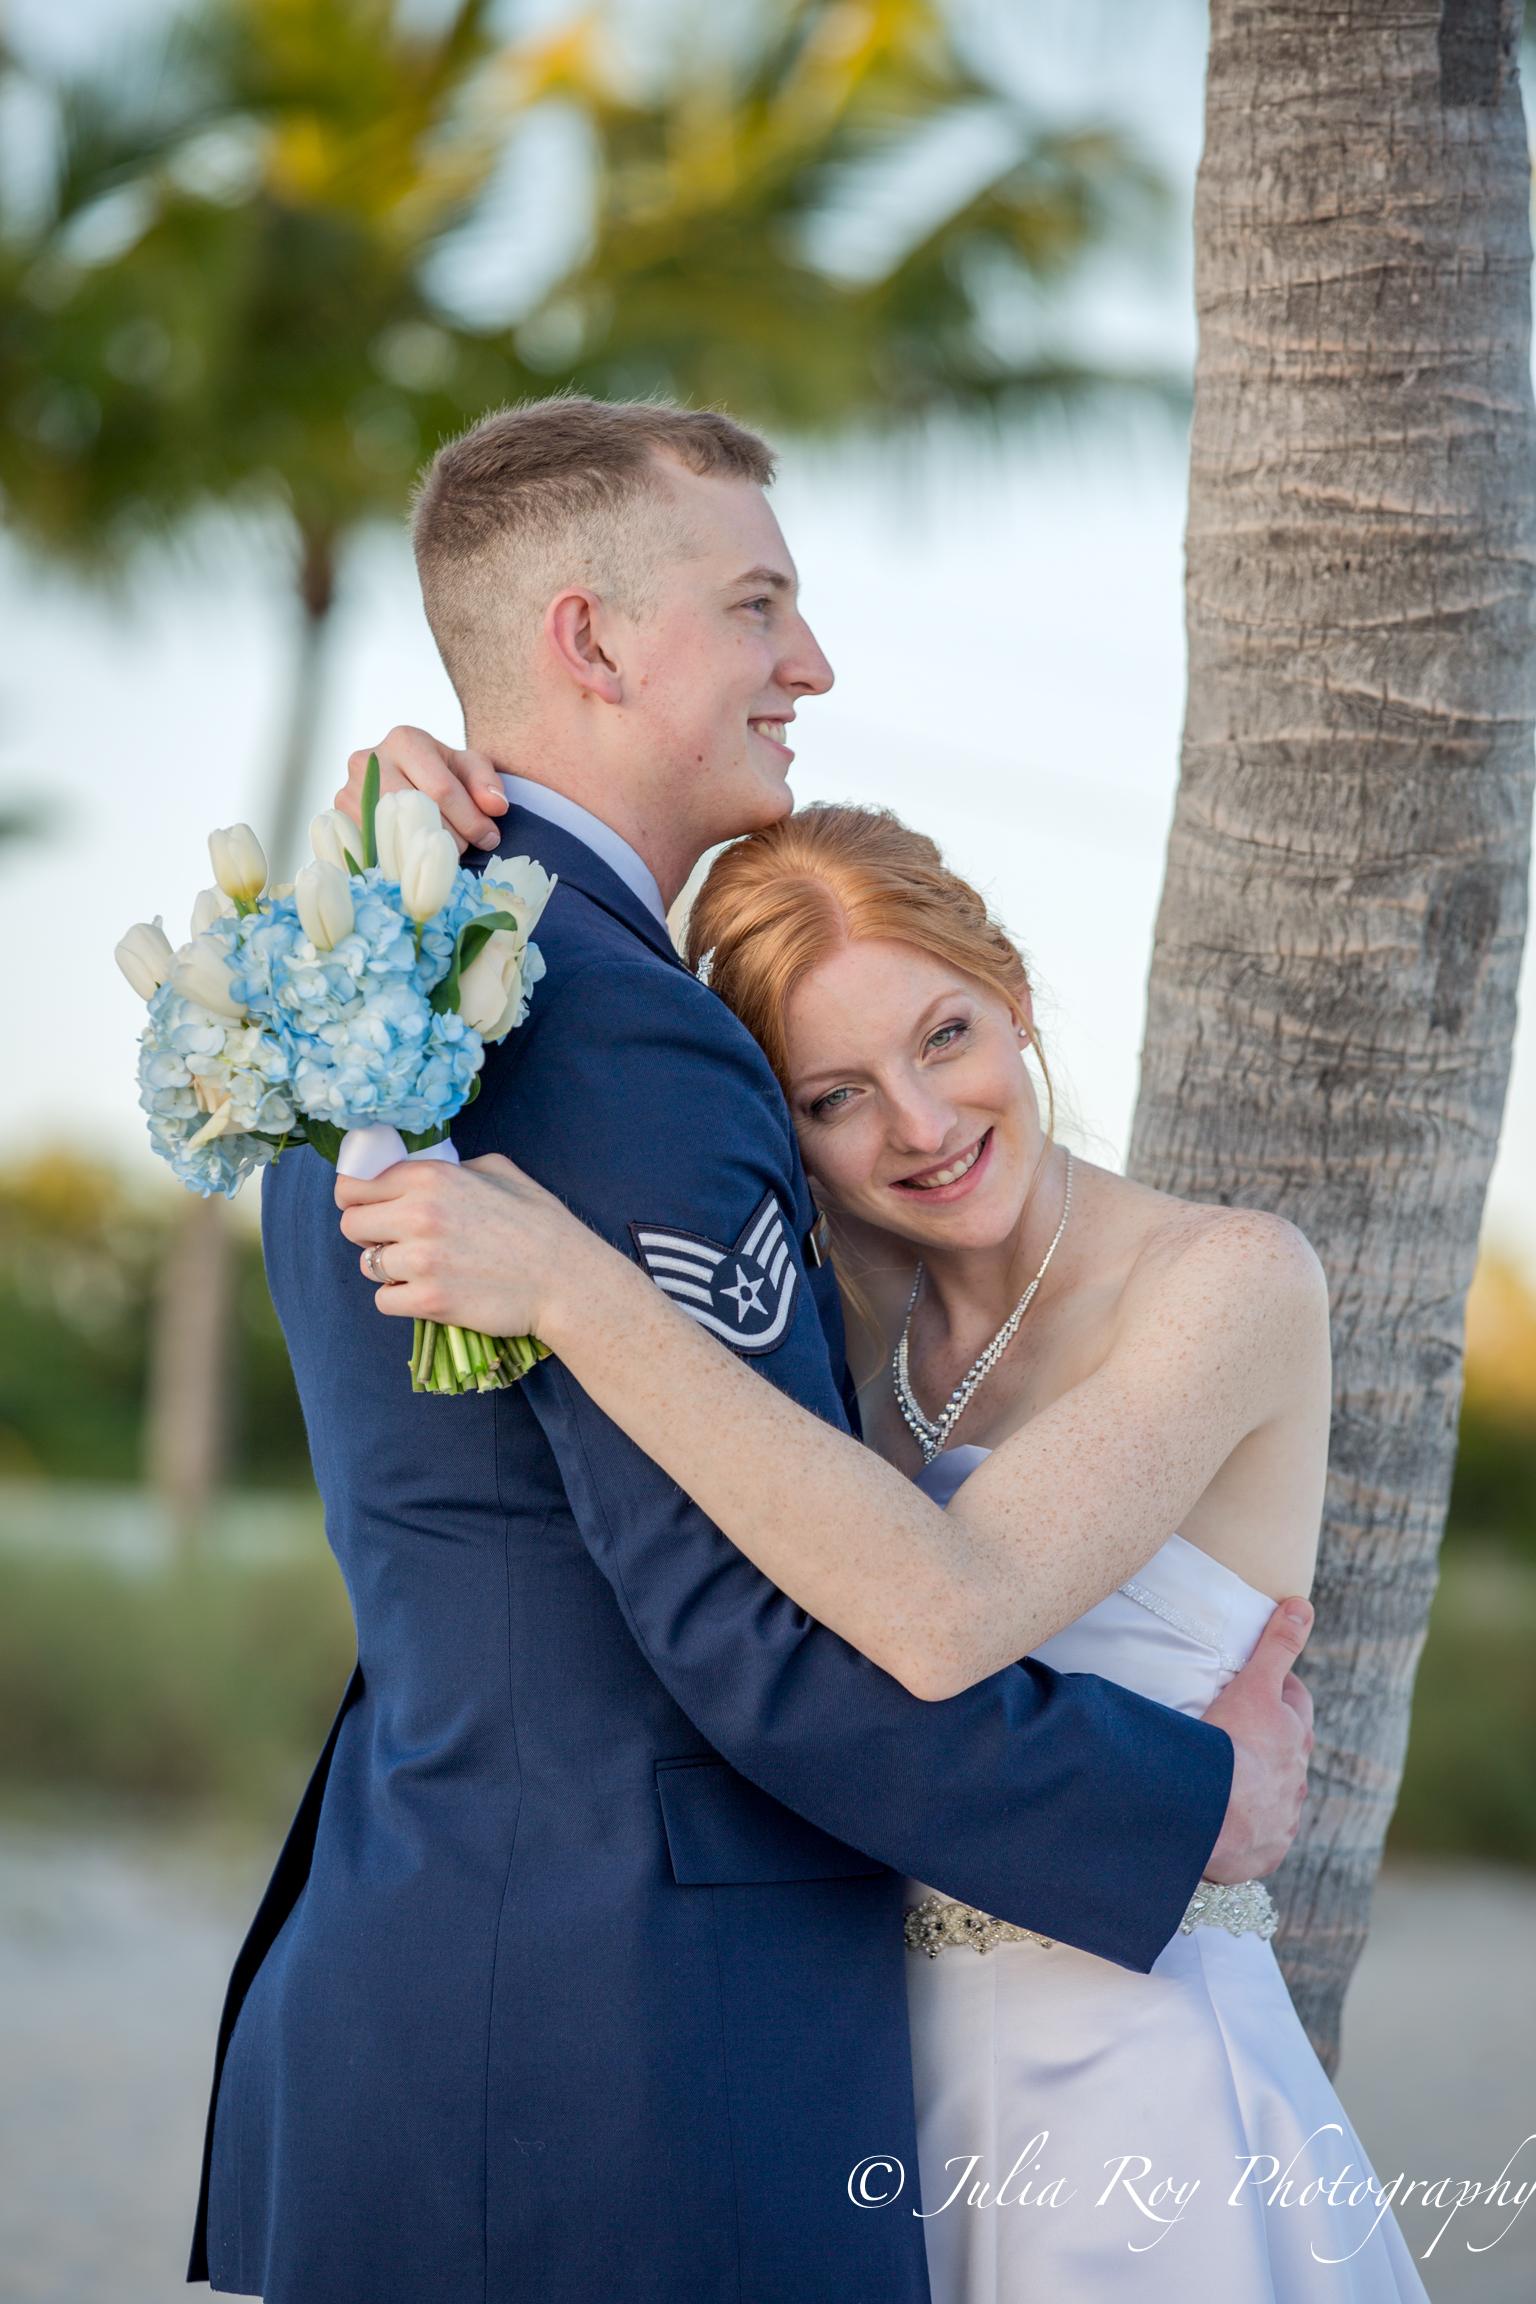 Smathers beach wedding in Key WEst